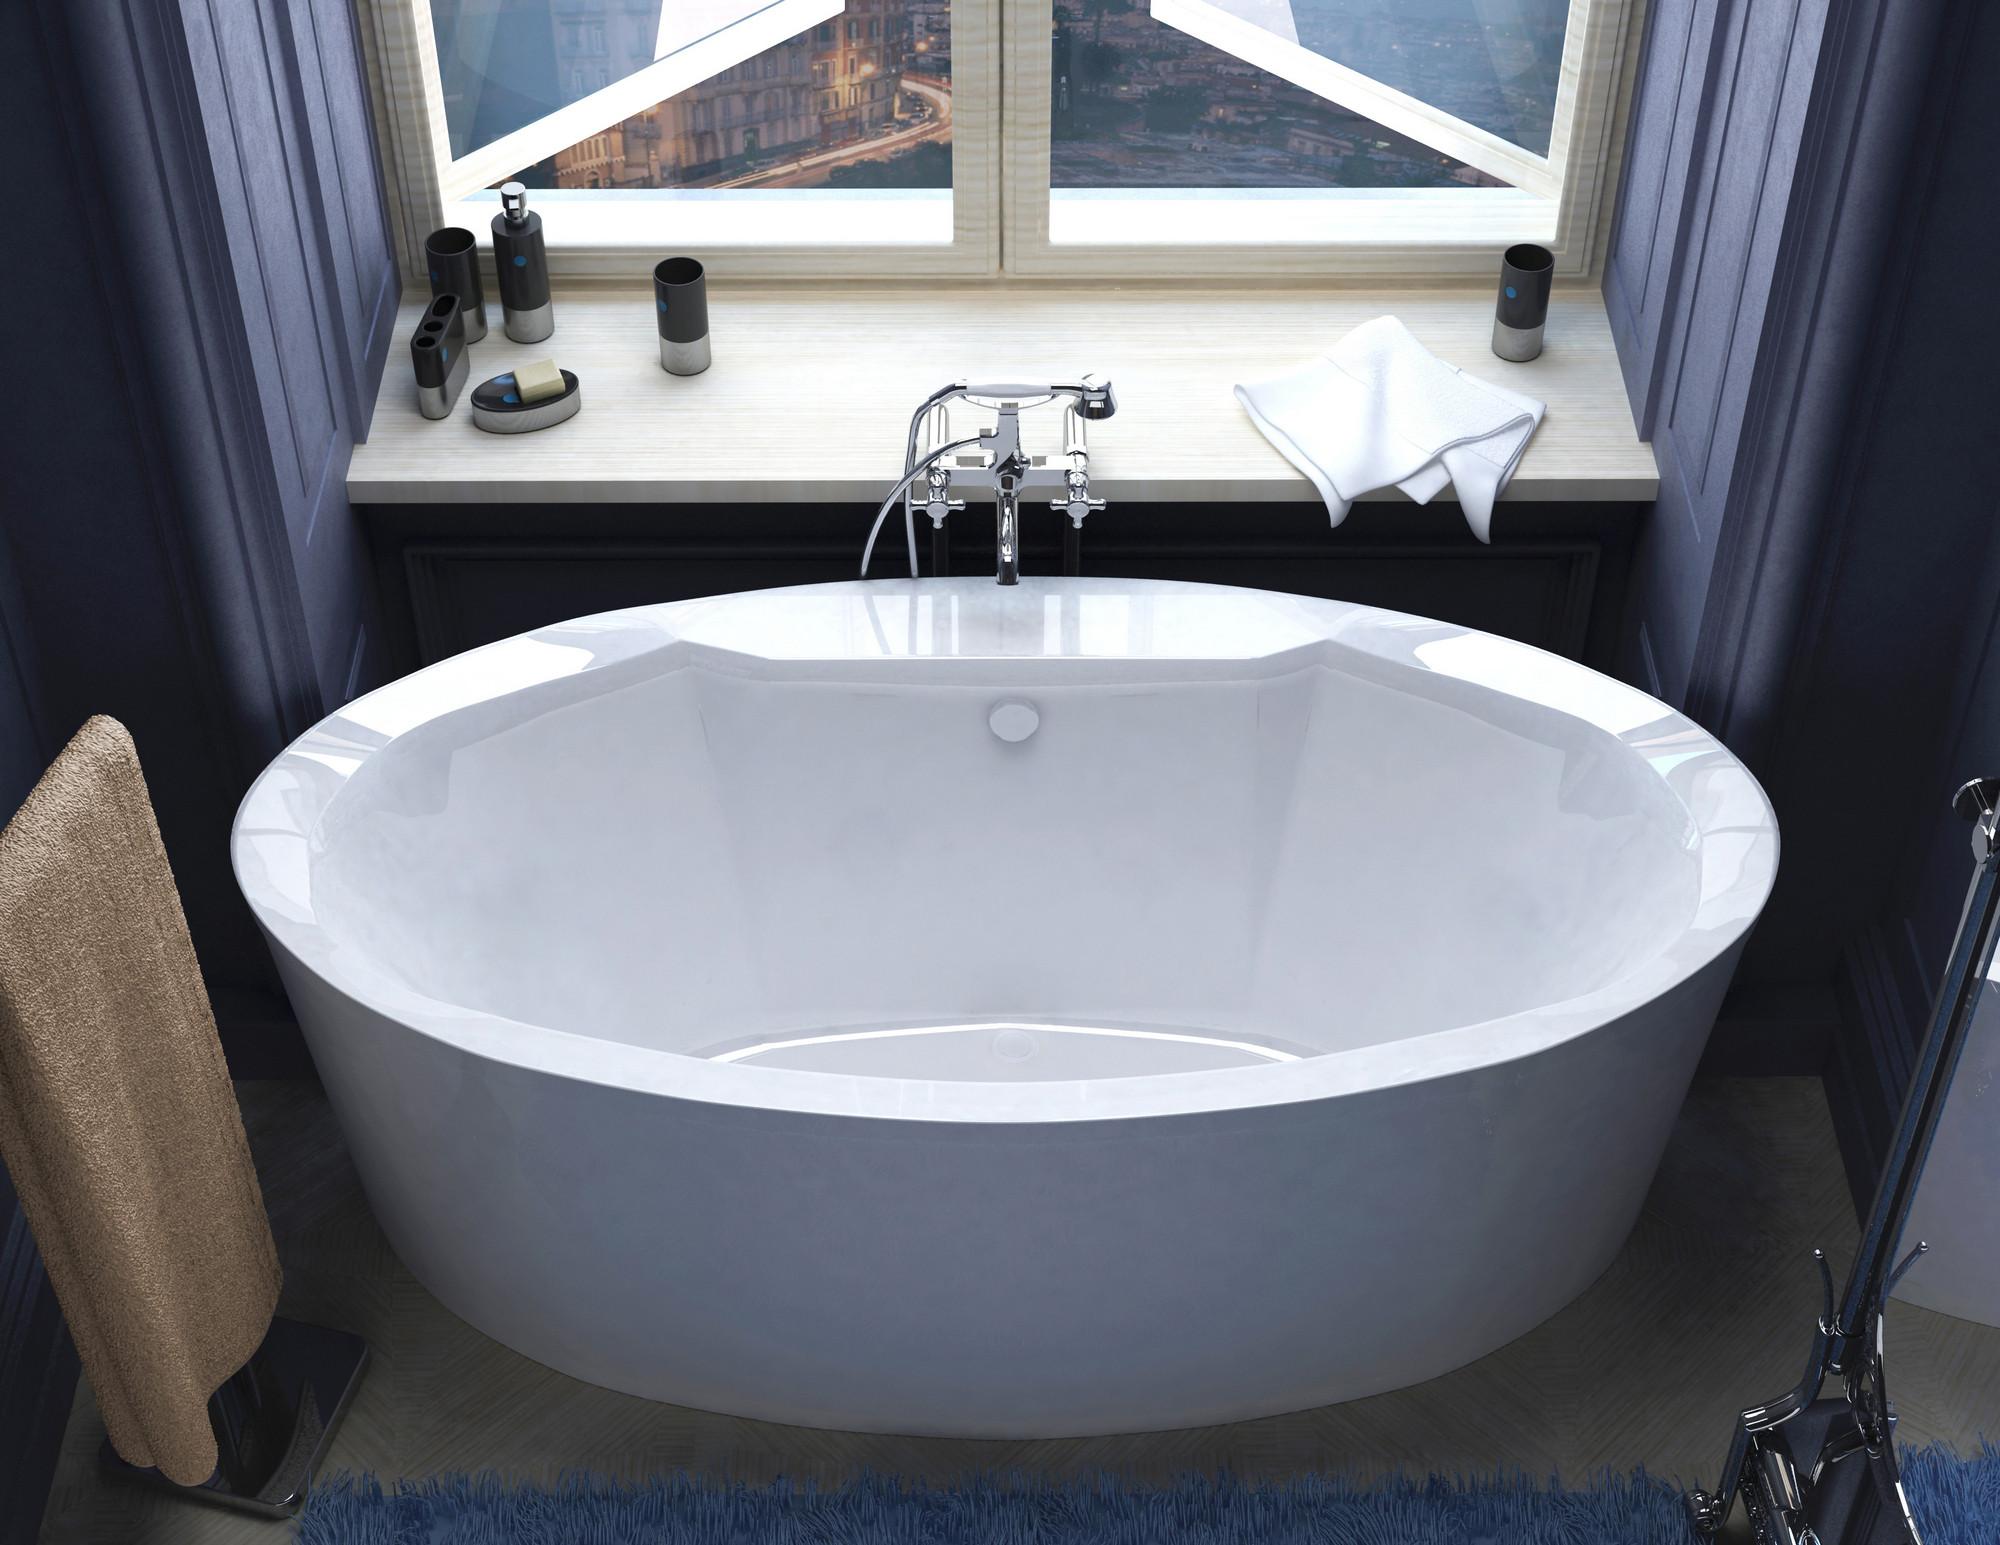 MediTub 3468SS Atlantis Suisse Acrylic Oval Free Standing Soaker Bathtub